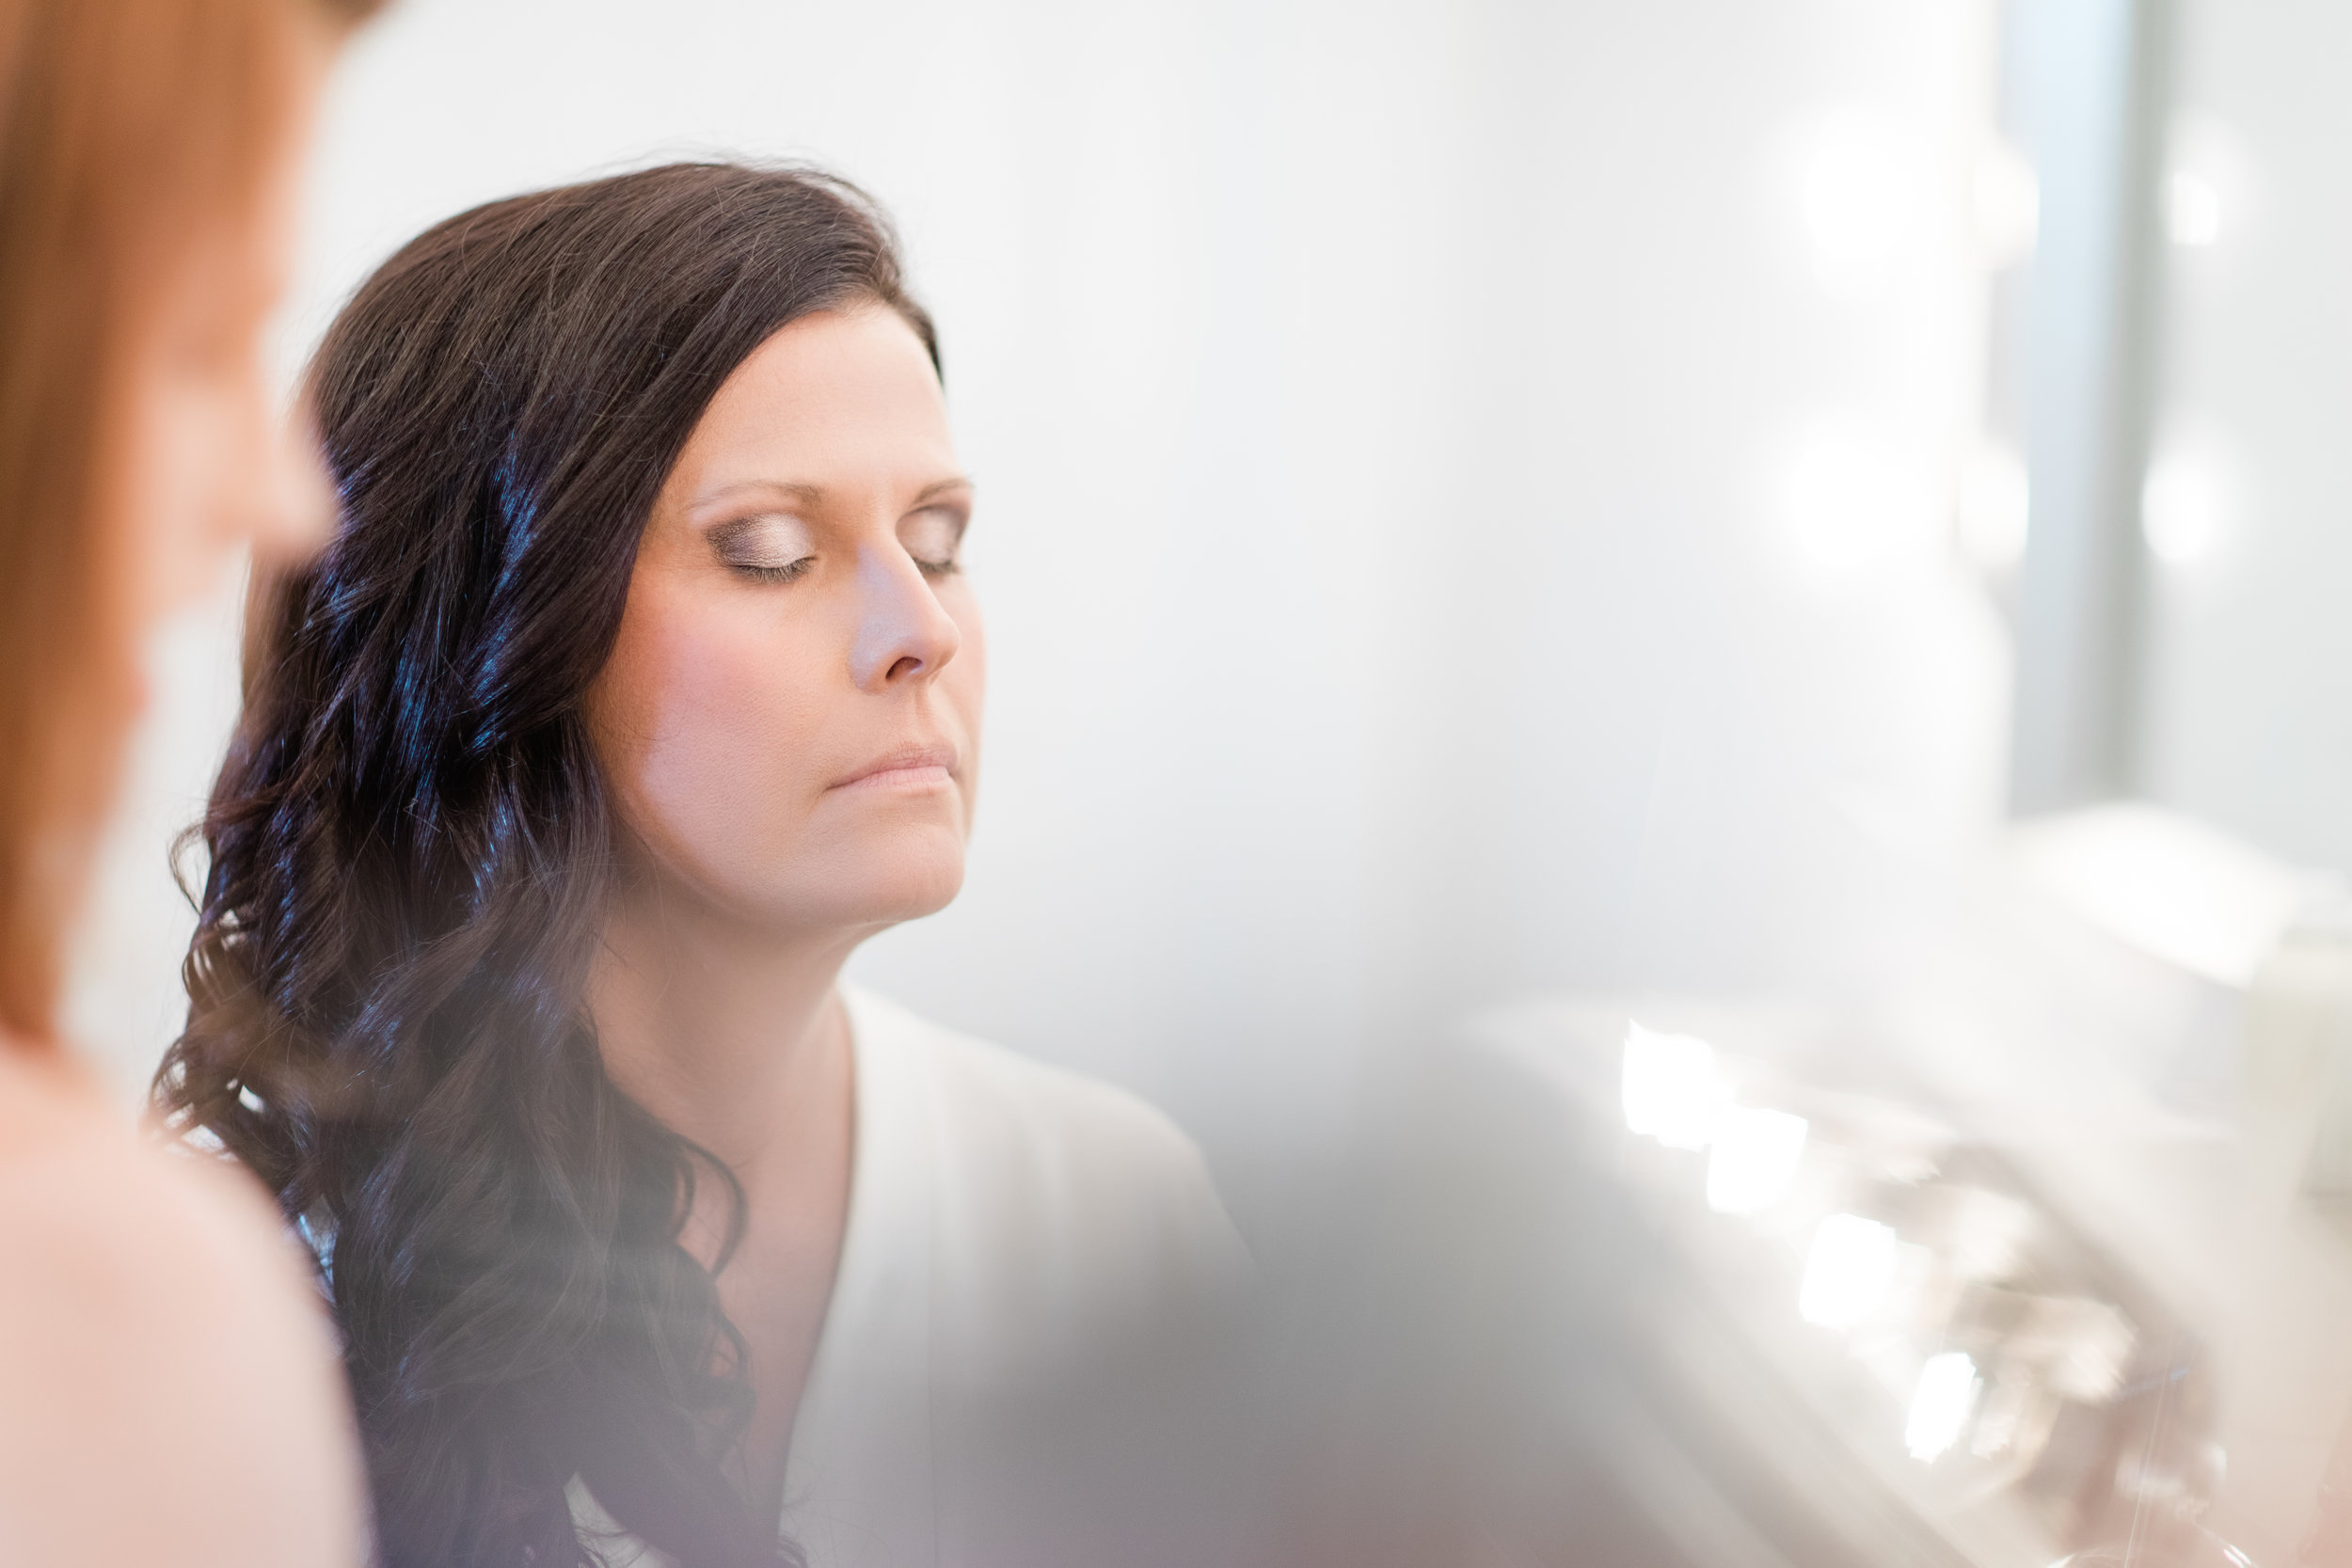 HAIR + MAKEUP ARTIST - Kristin Harper with The House of Harper   Bowling Green, Kentucky